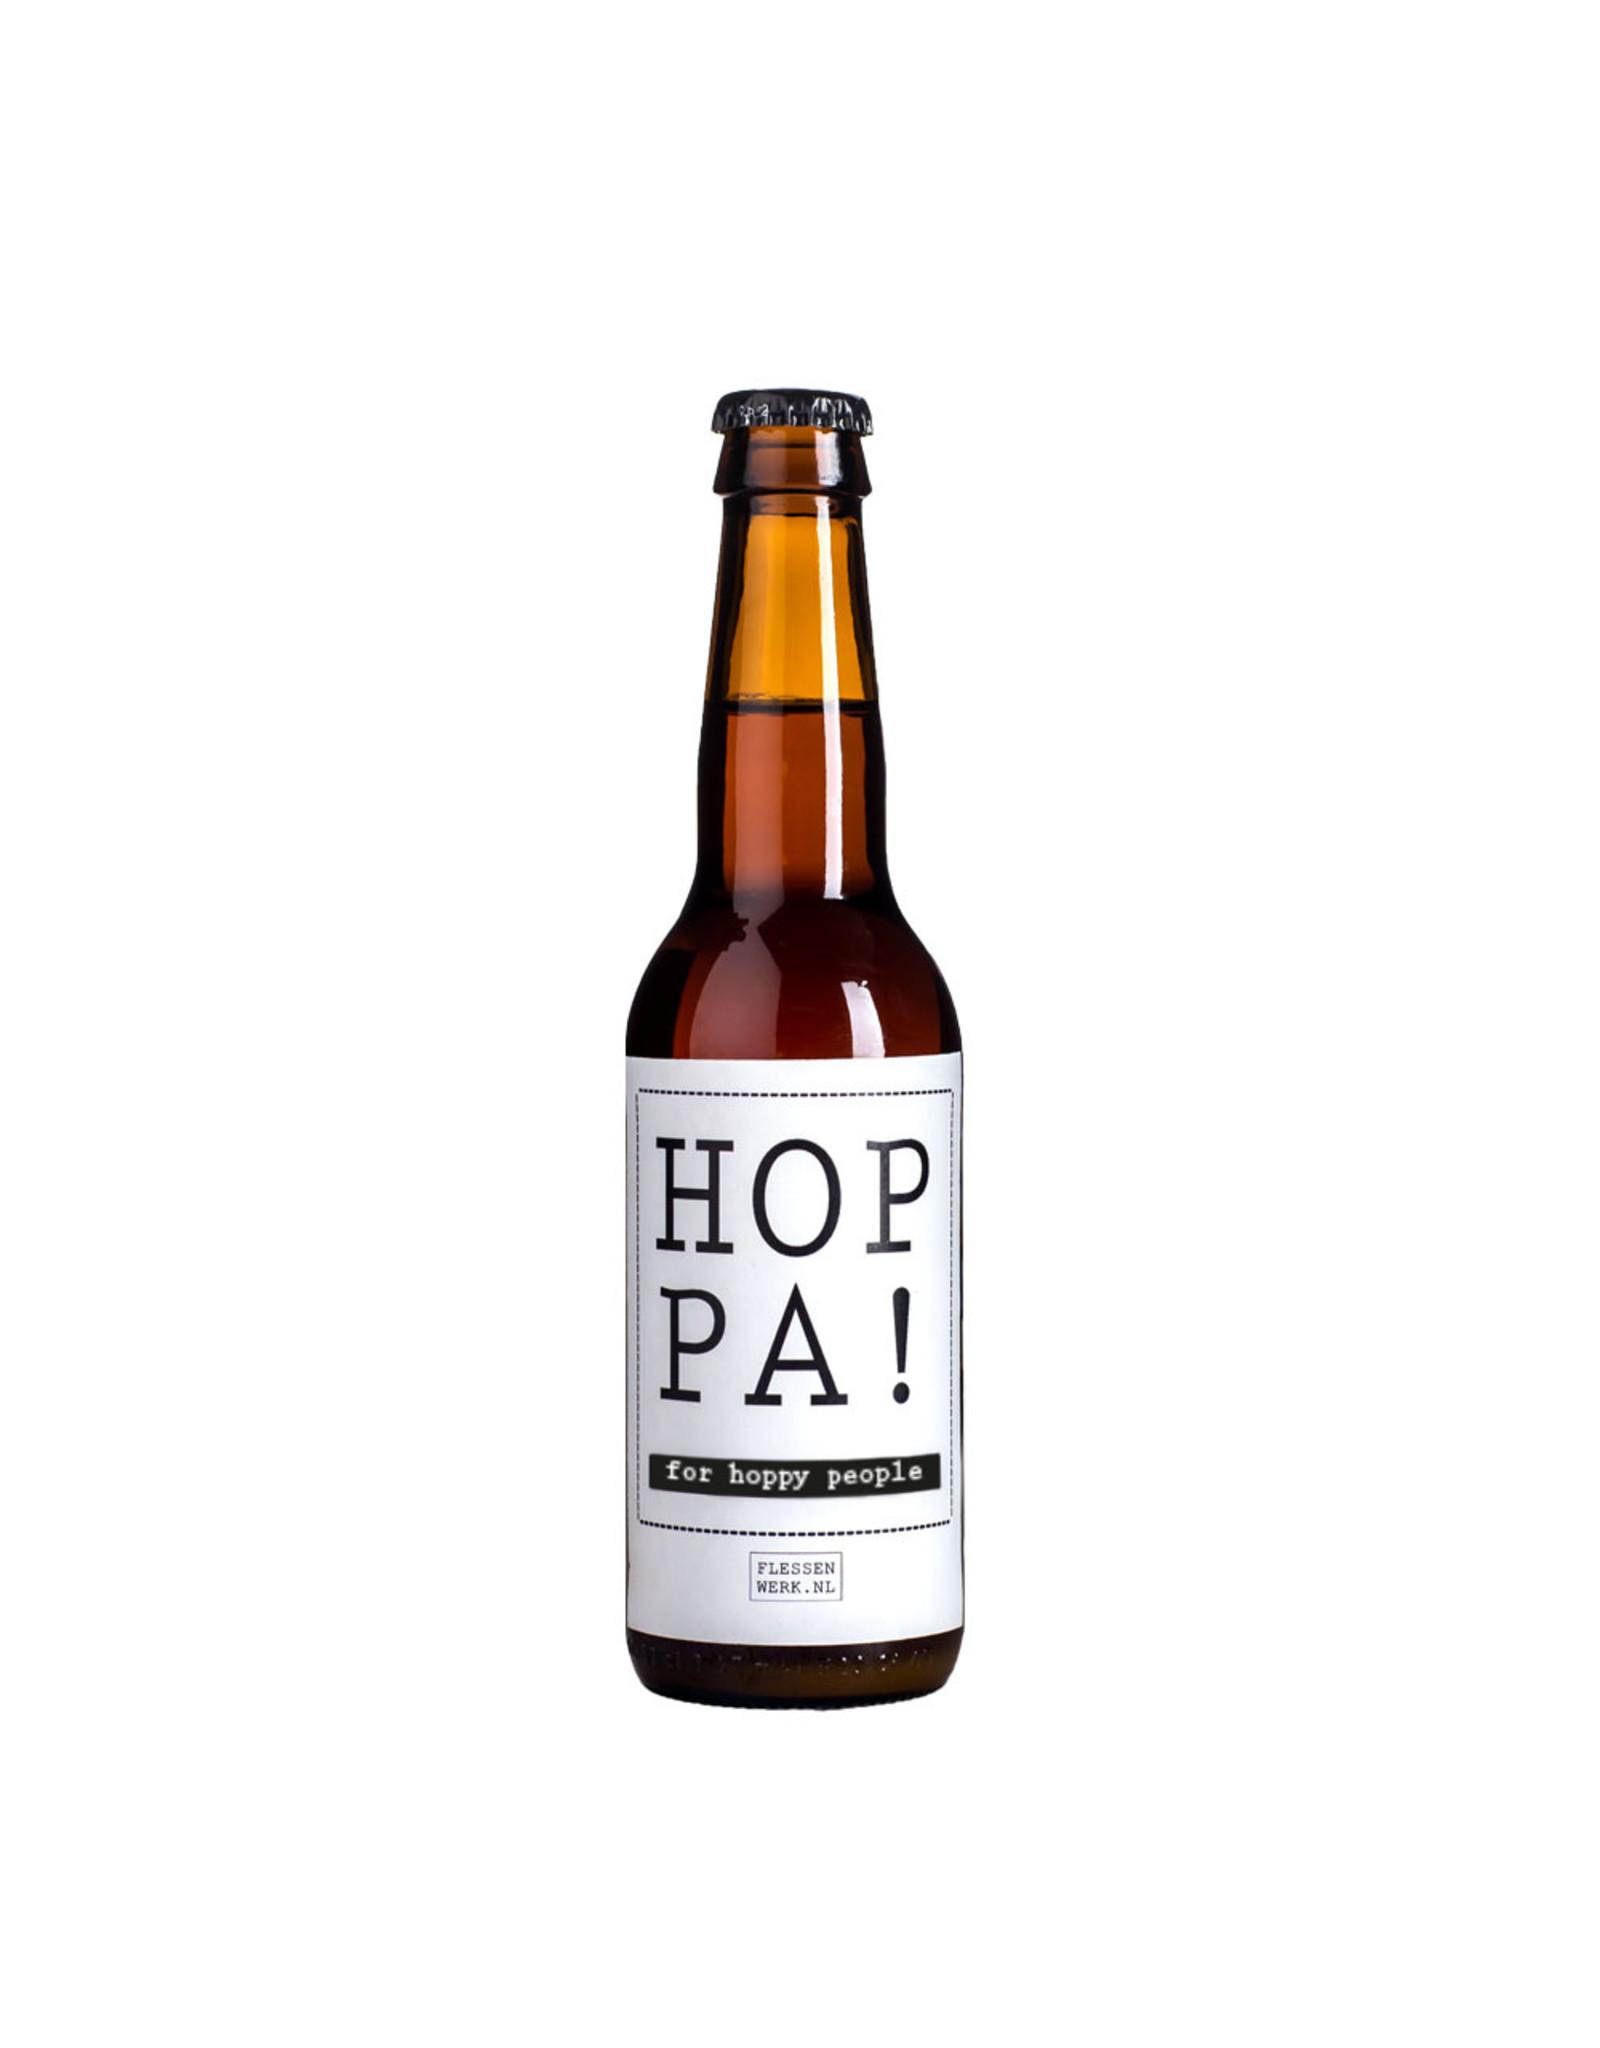 Hoppa bier klein - per 24